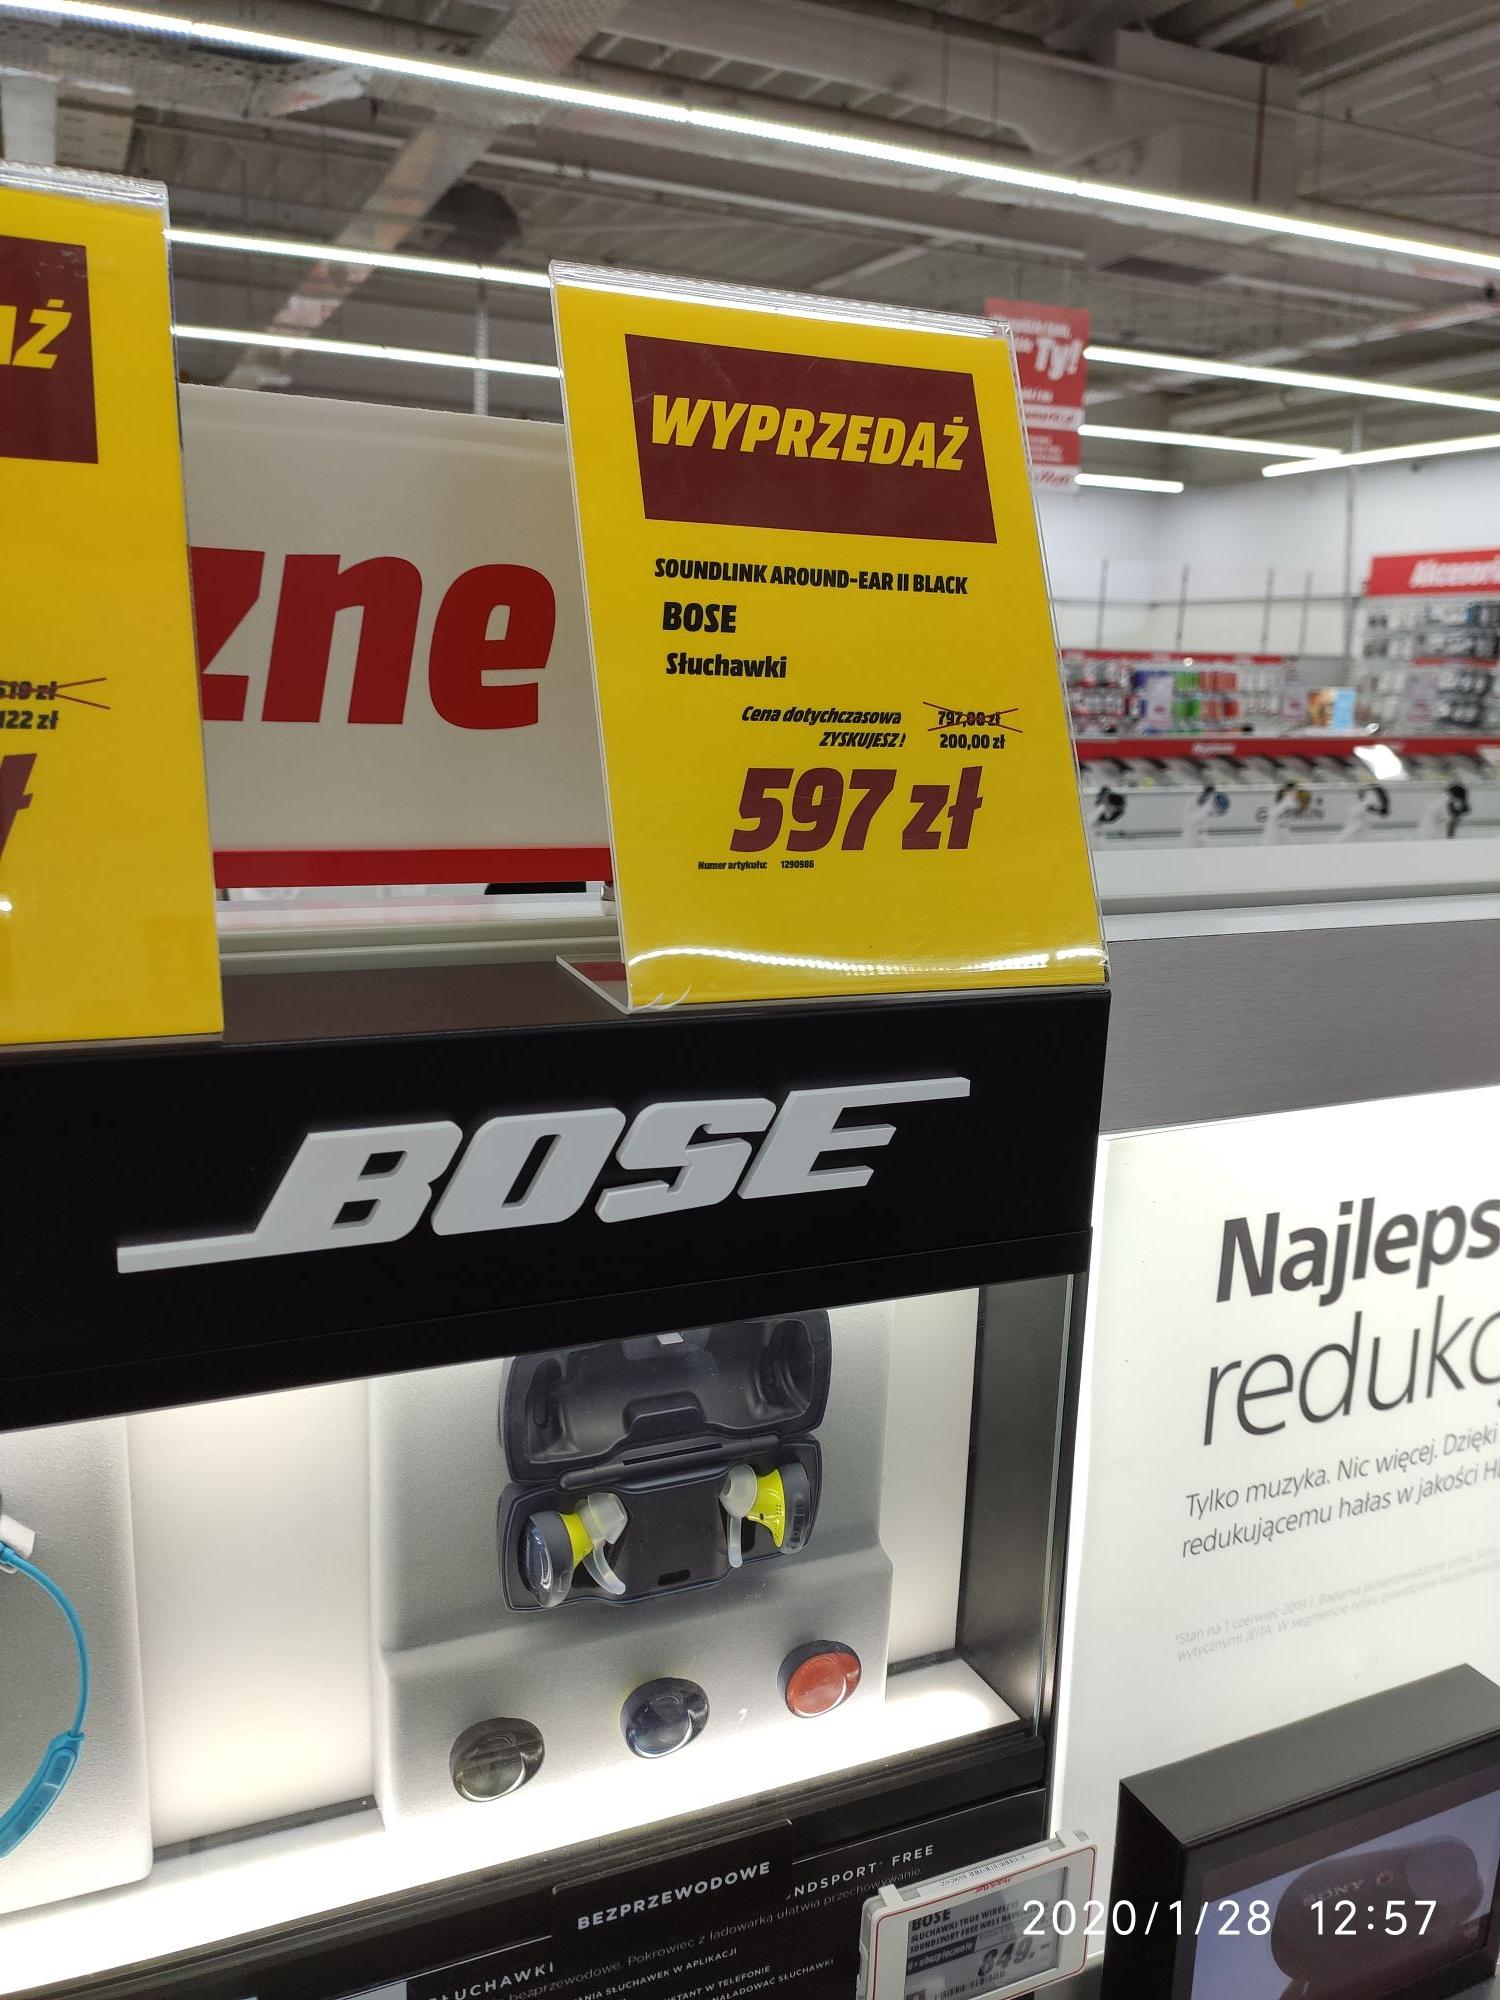 Słuchawki Bose Soundlink Around ear 2 @mediamarkt olsztyn